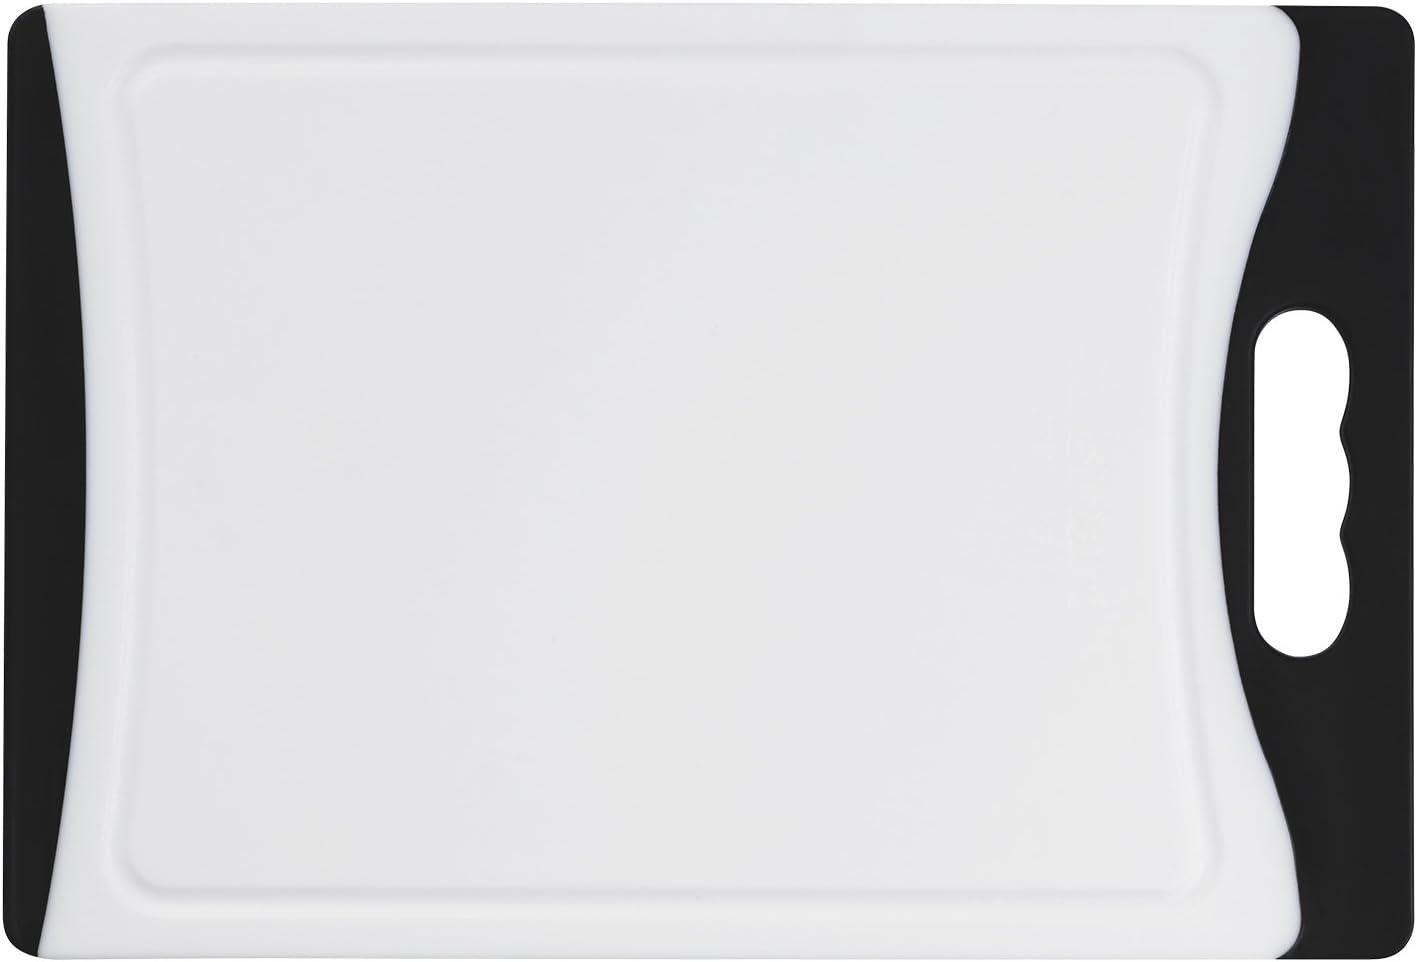 "Cuisinart CPB-11WB 11"" Board with black Trim, White"